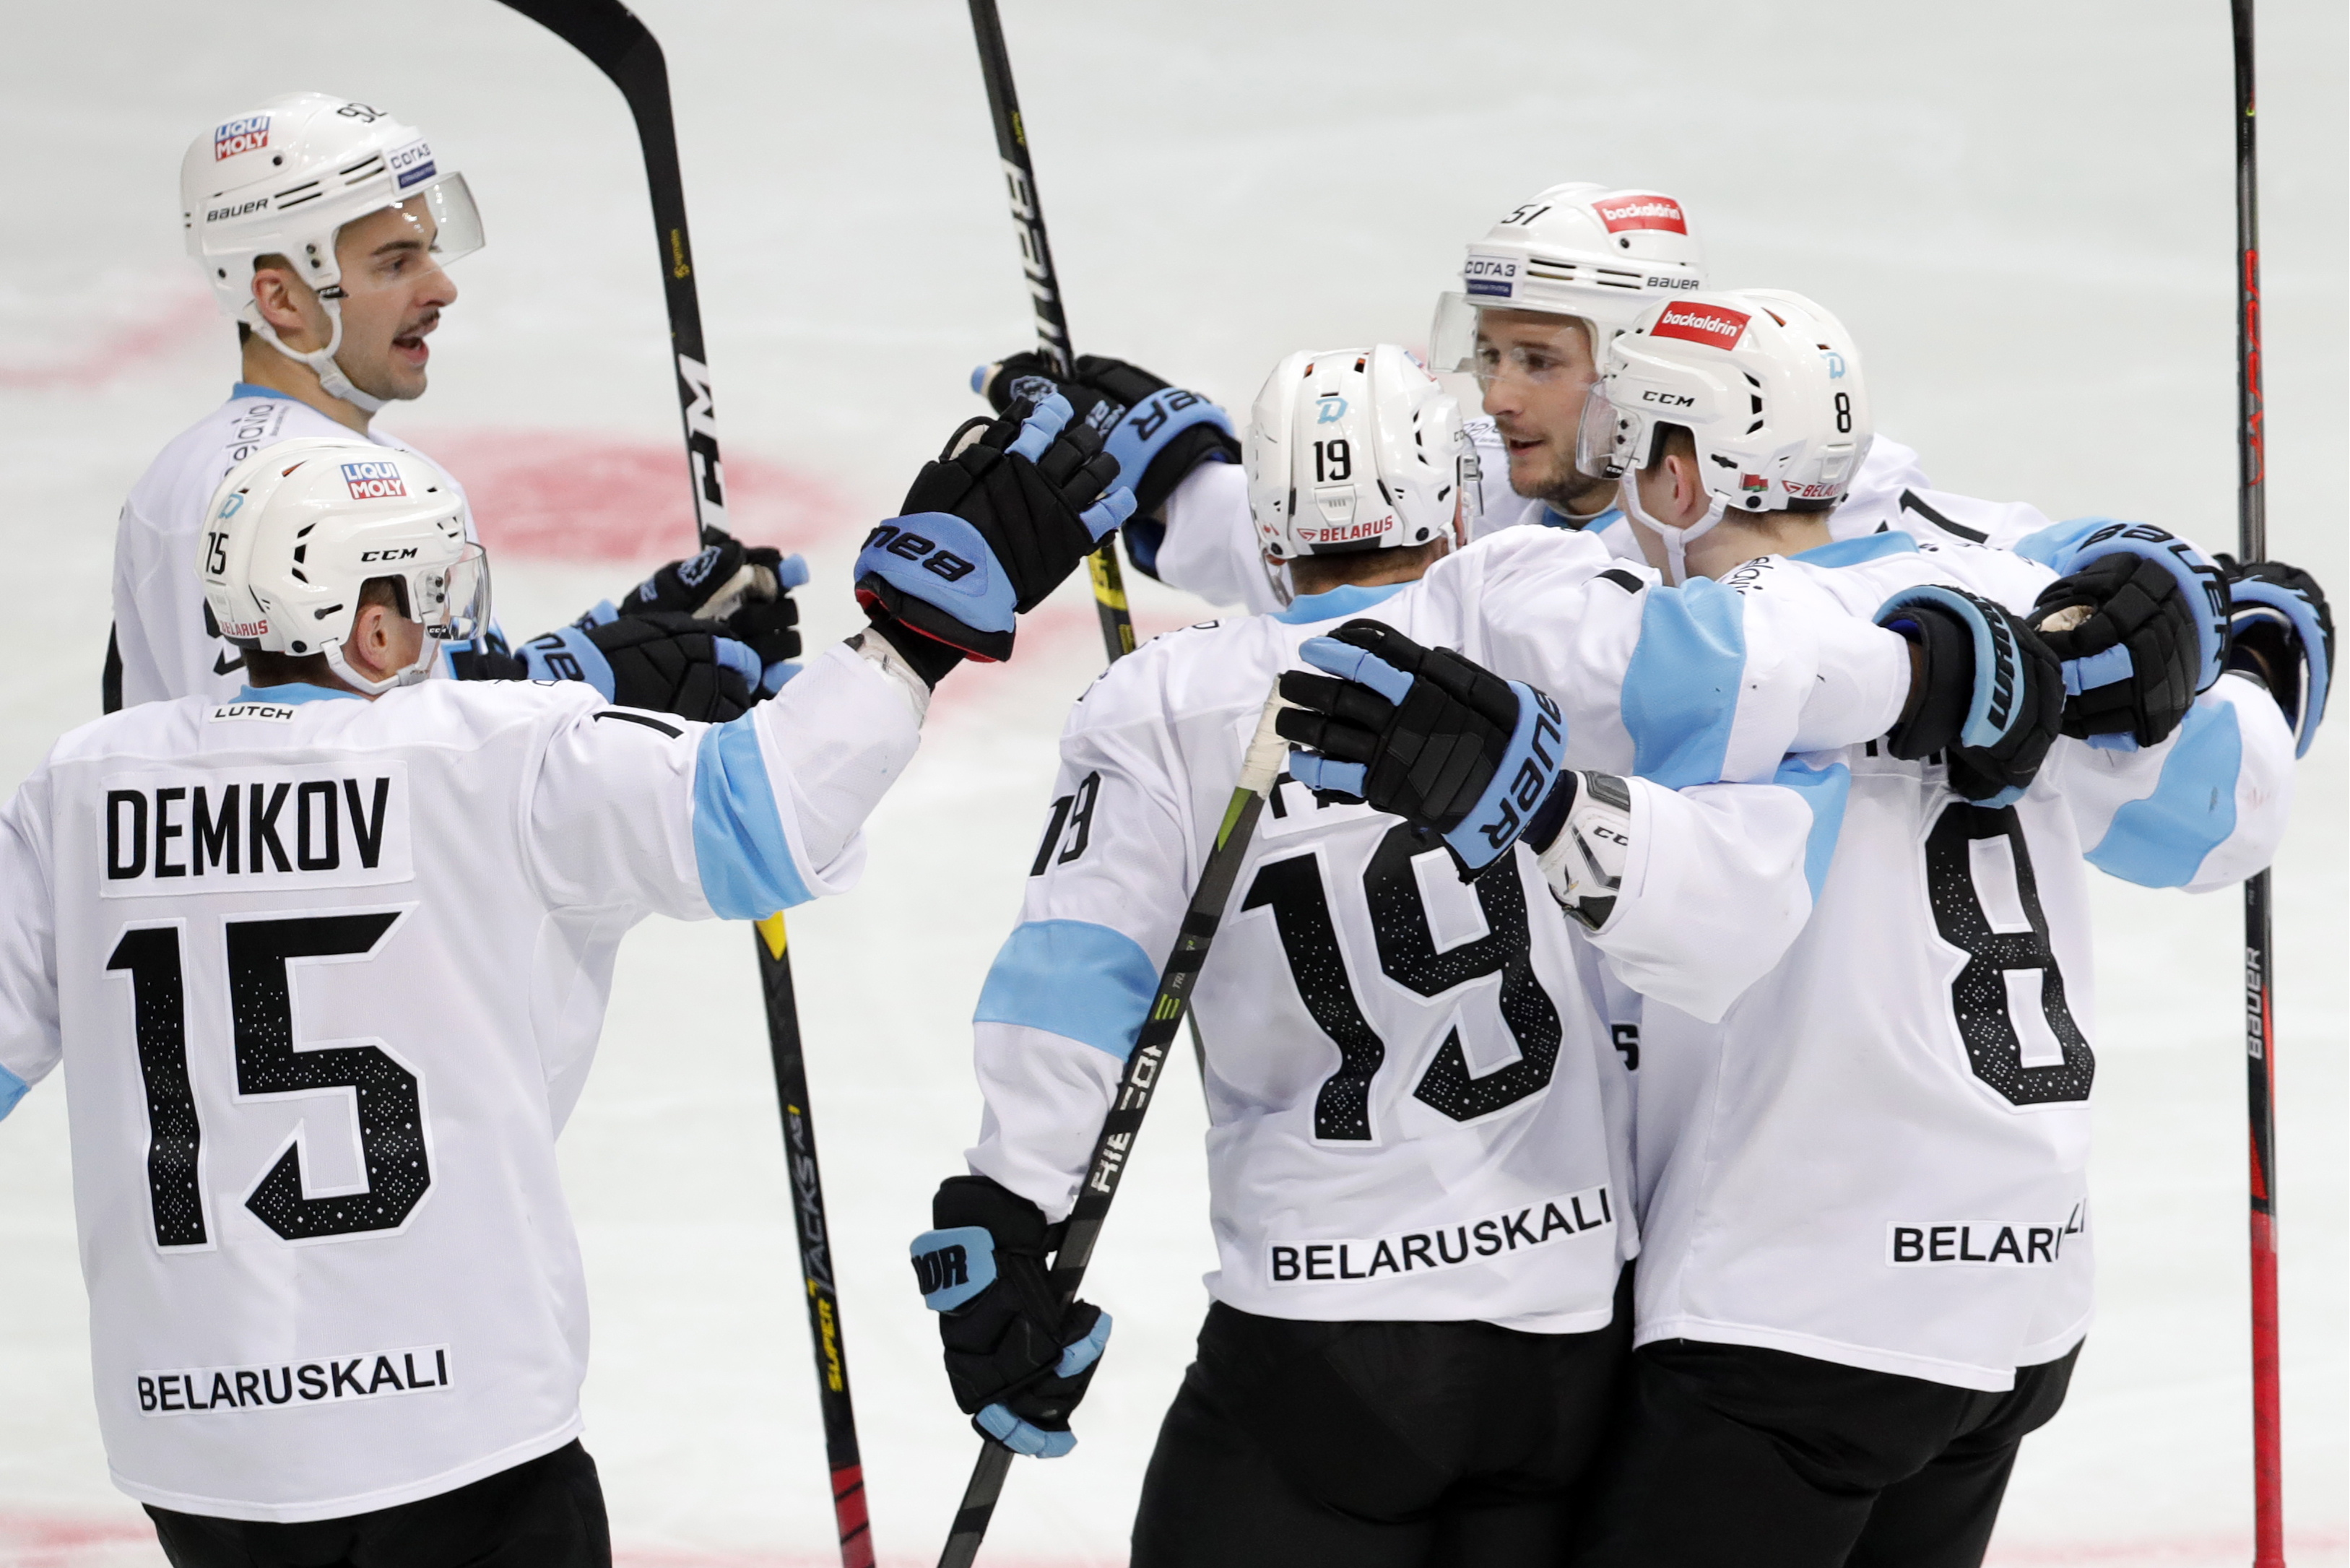 2019/2020 Kontinental Hockey League: Spartak Moscow vs Dinamo Minsk